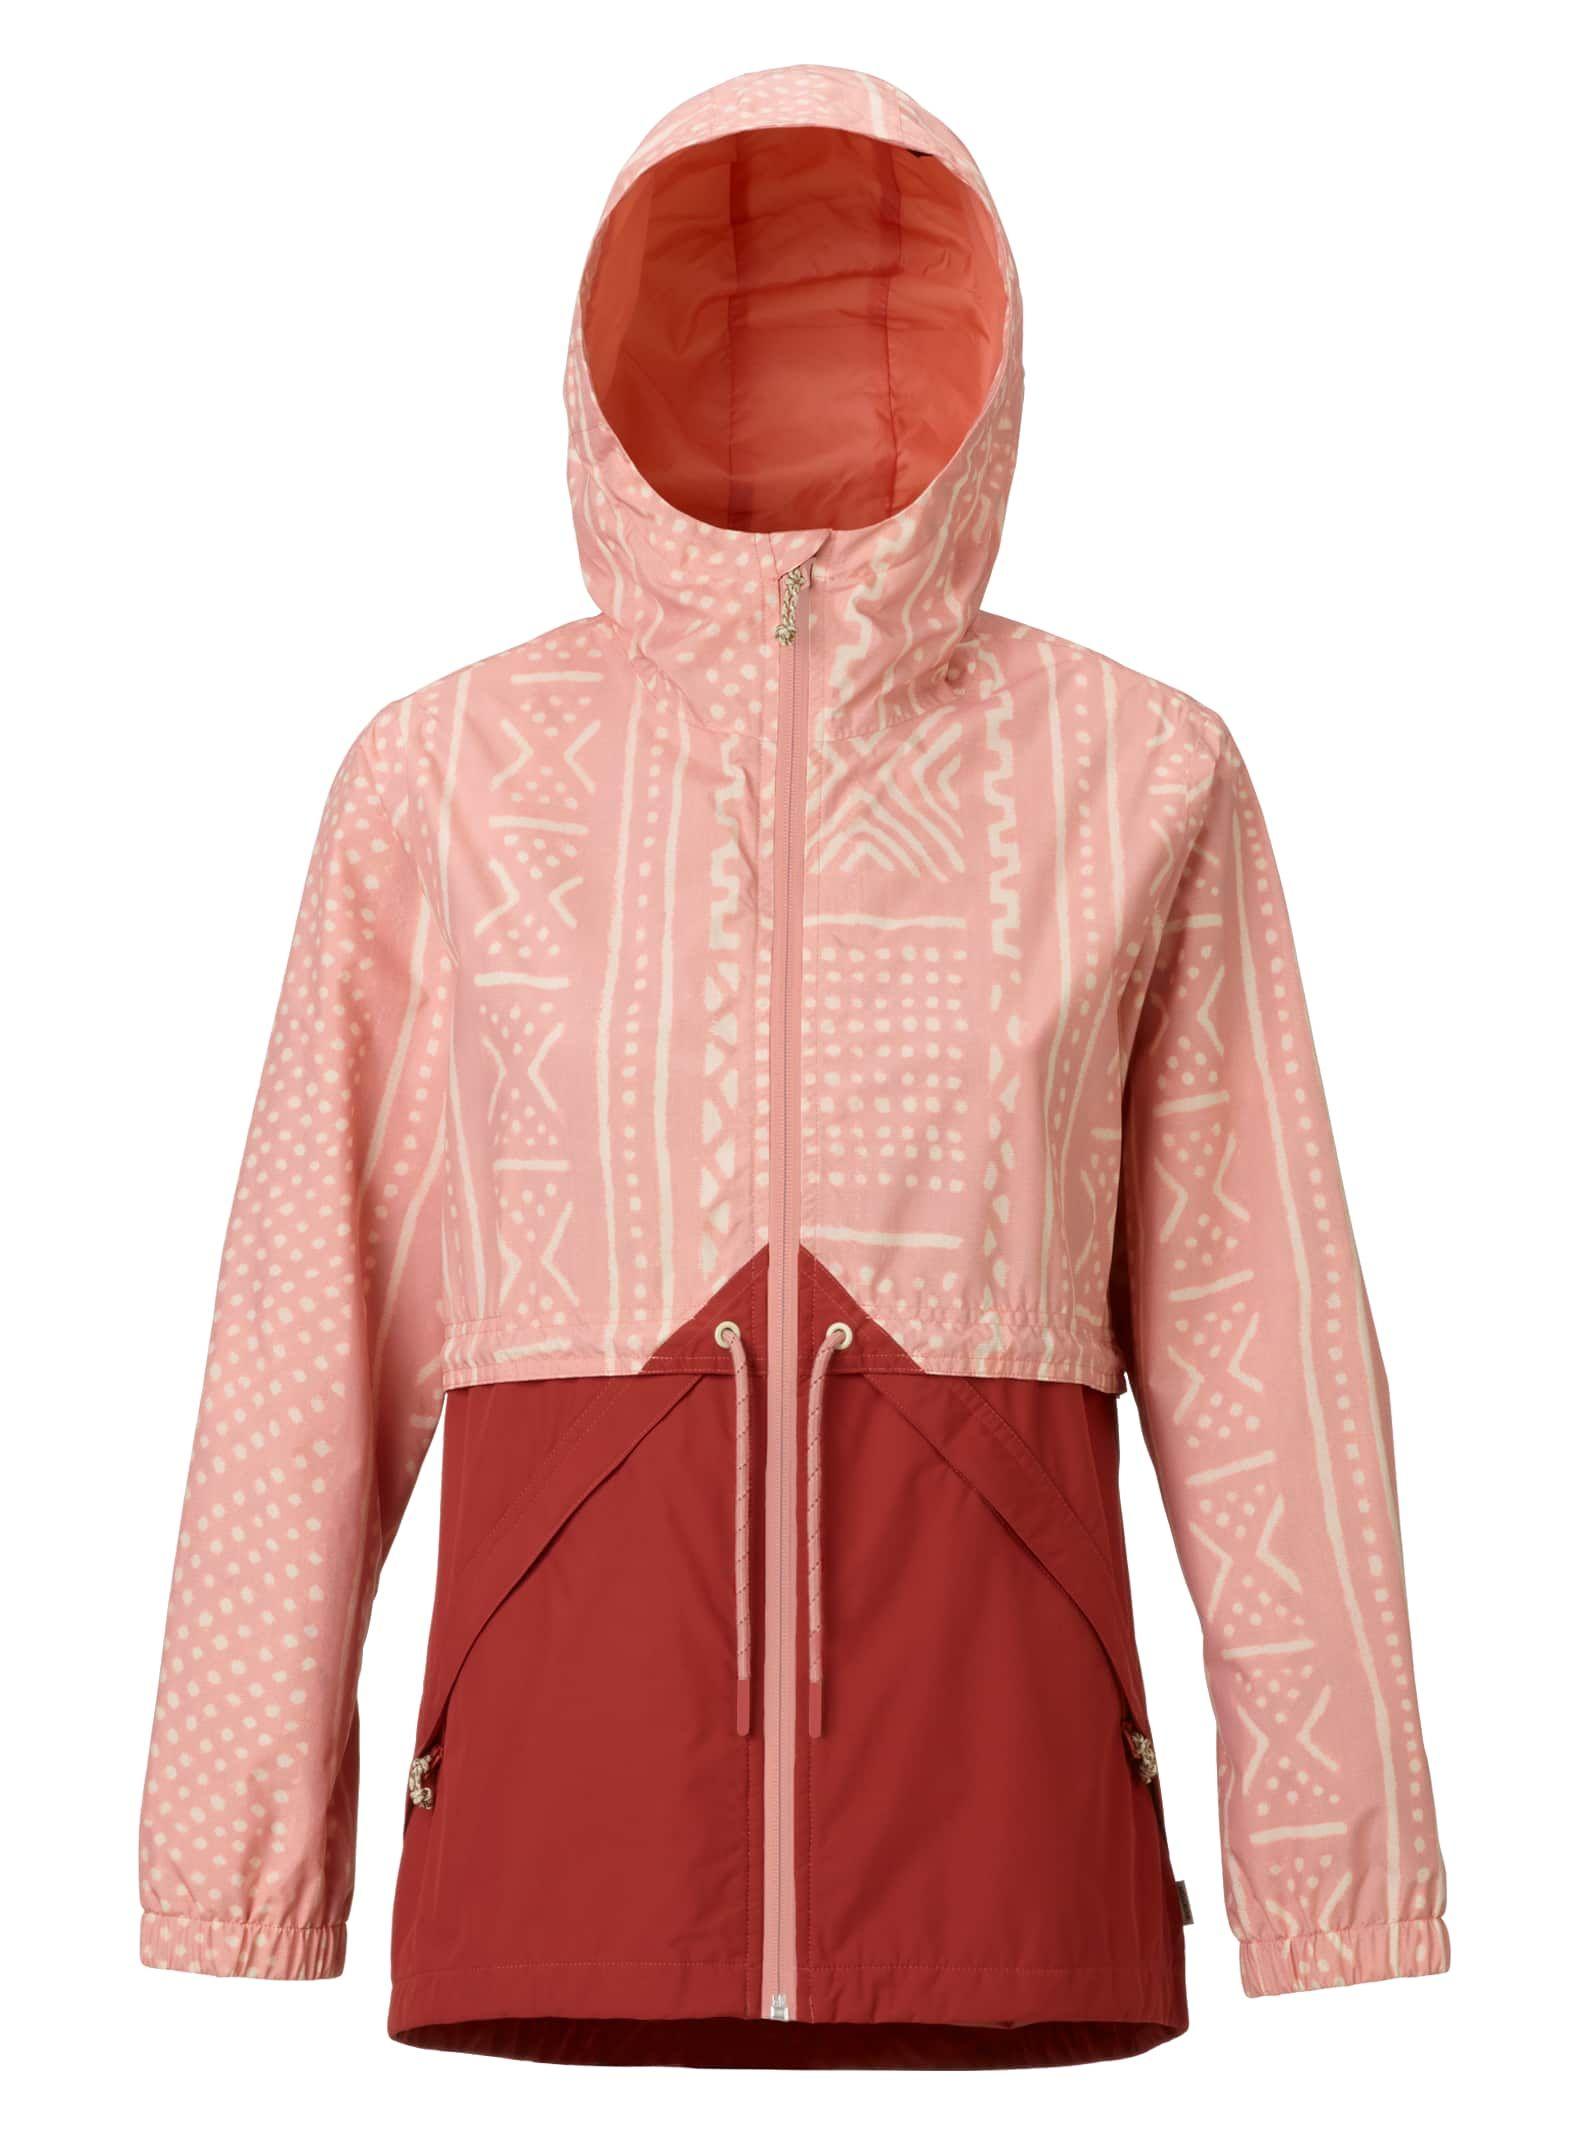 Etecredpow Mens Raglan Sleeve Quick Dry Stylish Contrast Color Hooded Sweatshirts